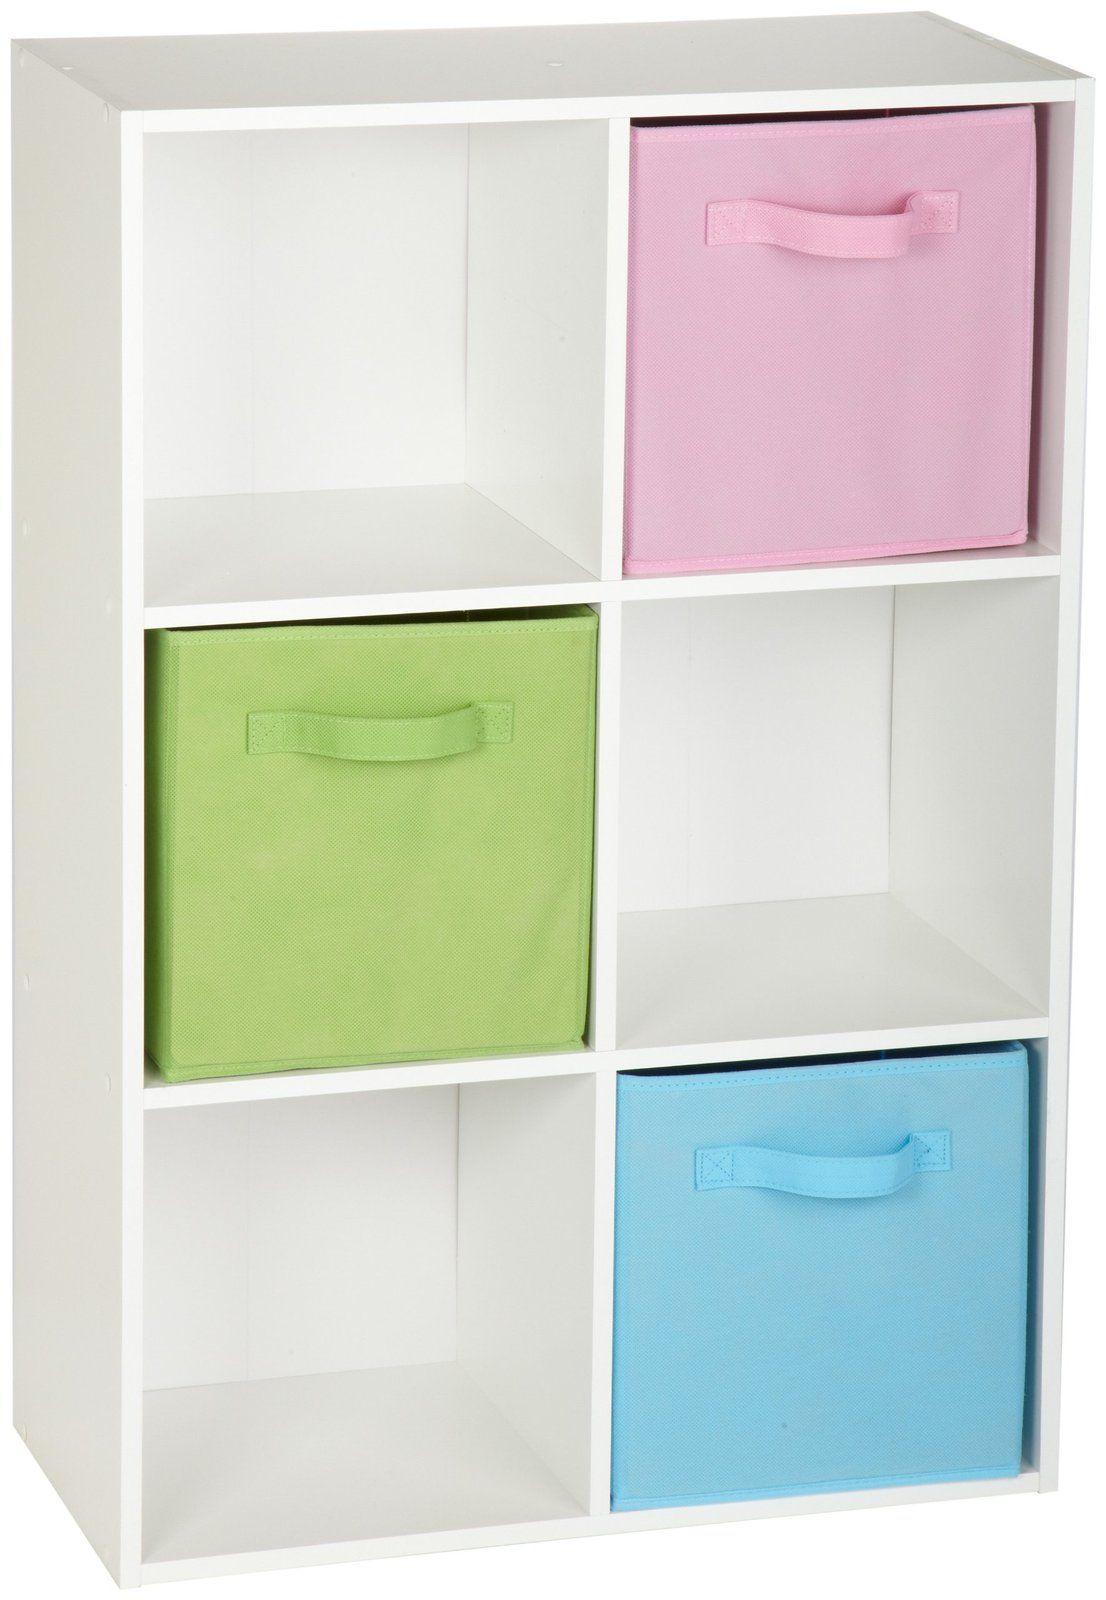 ClosetMaid 899600 6 Cube Stackable Laminate Organizer